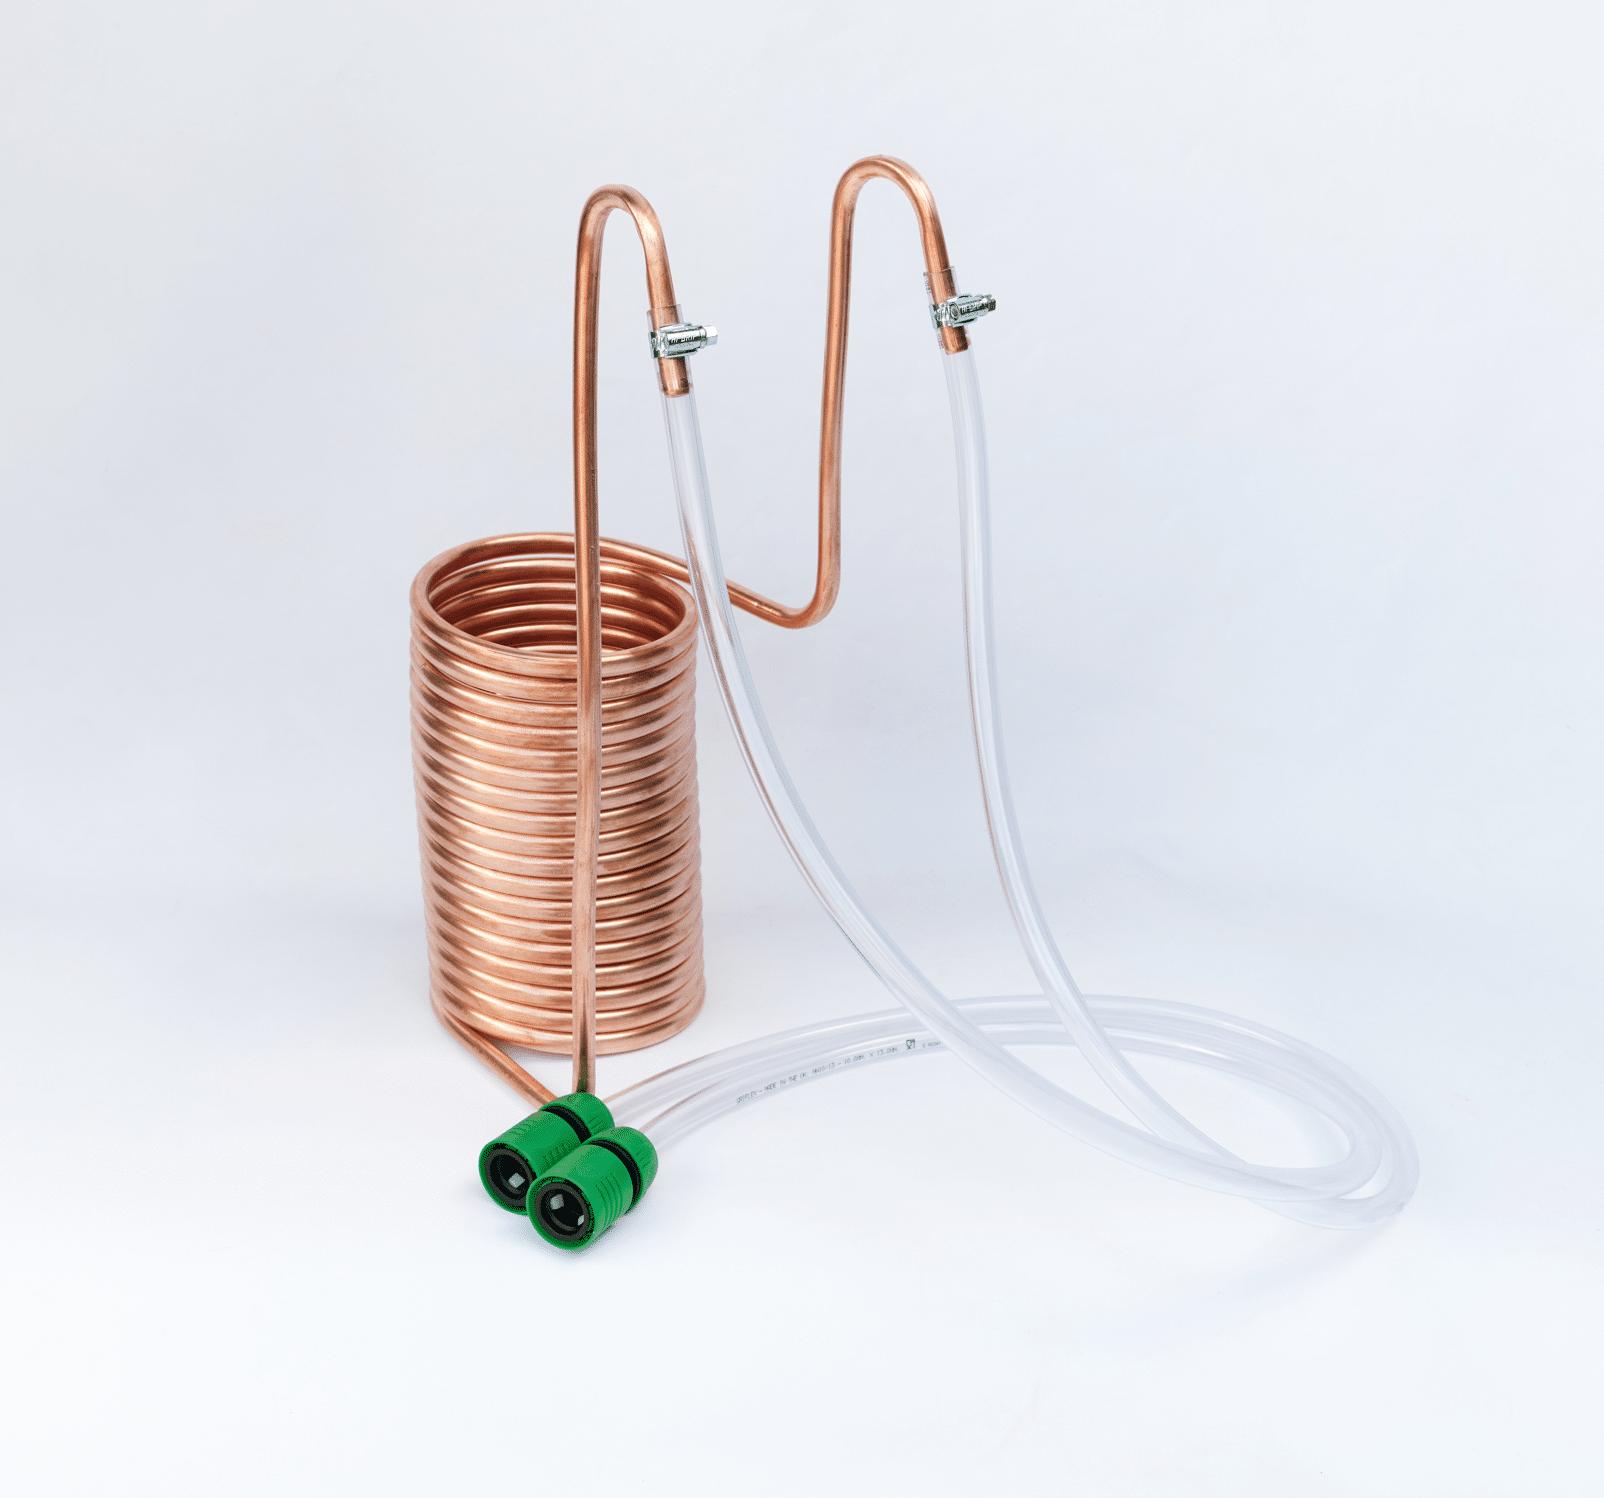 homebrew immersion copper wort chiller for wort cooling homebrew